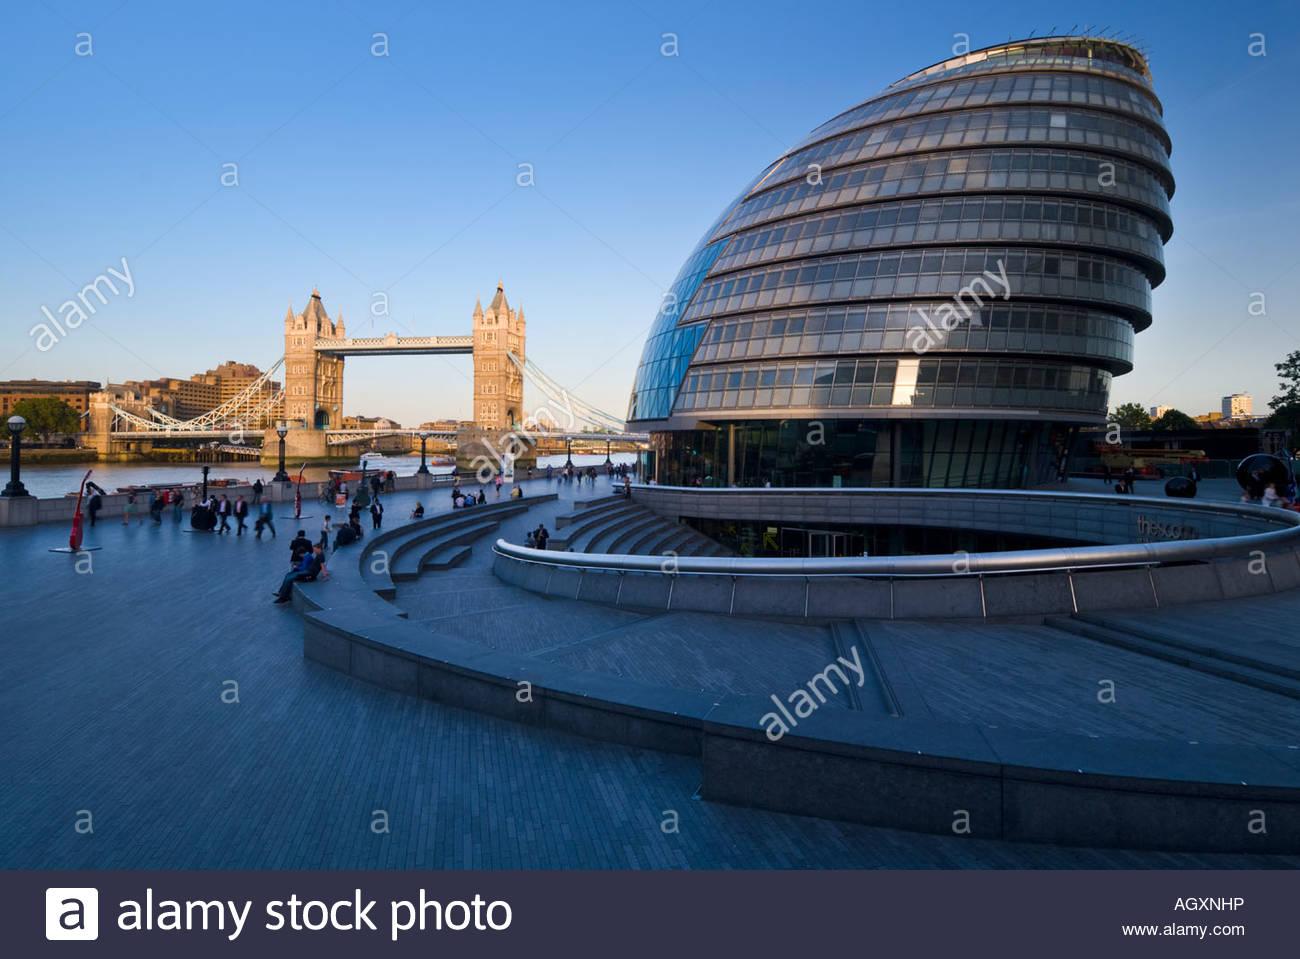 New City Hall and Tower Bridge, London. - Stock Image